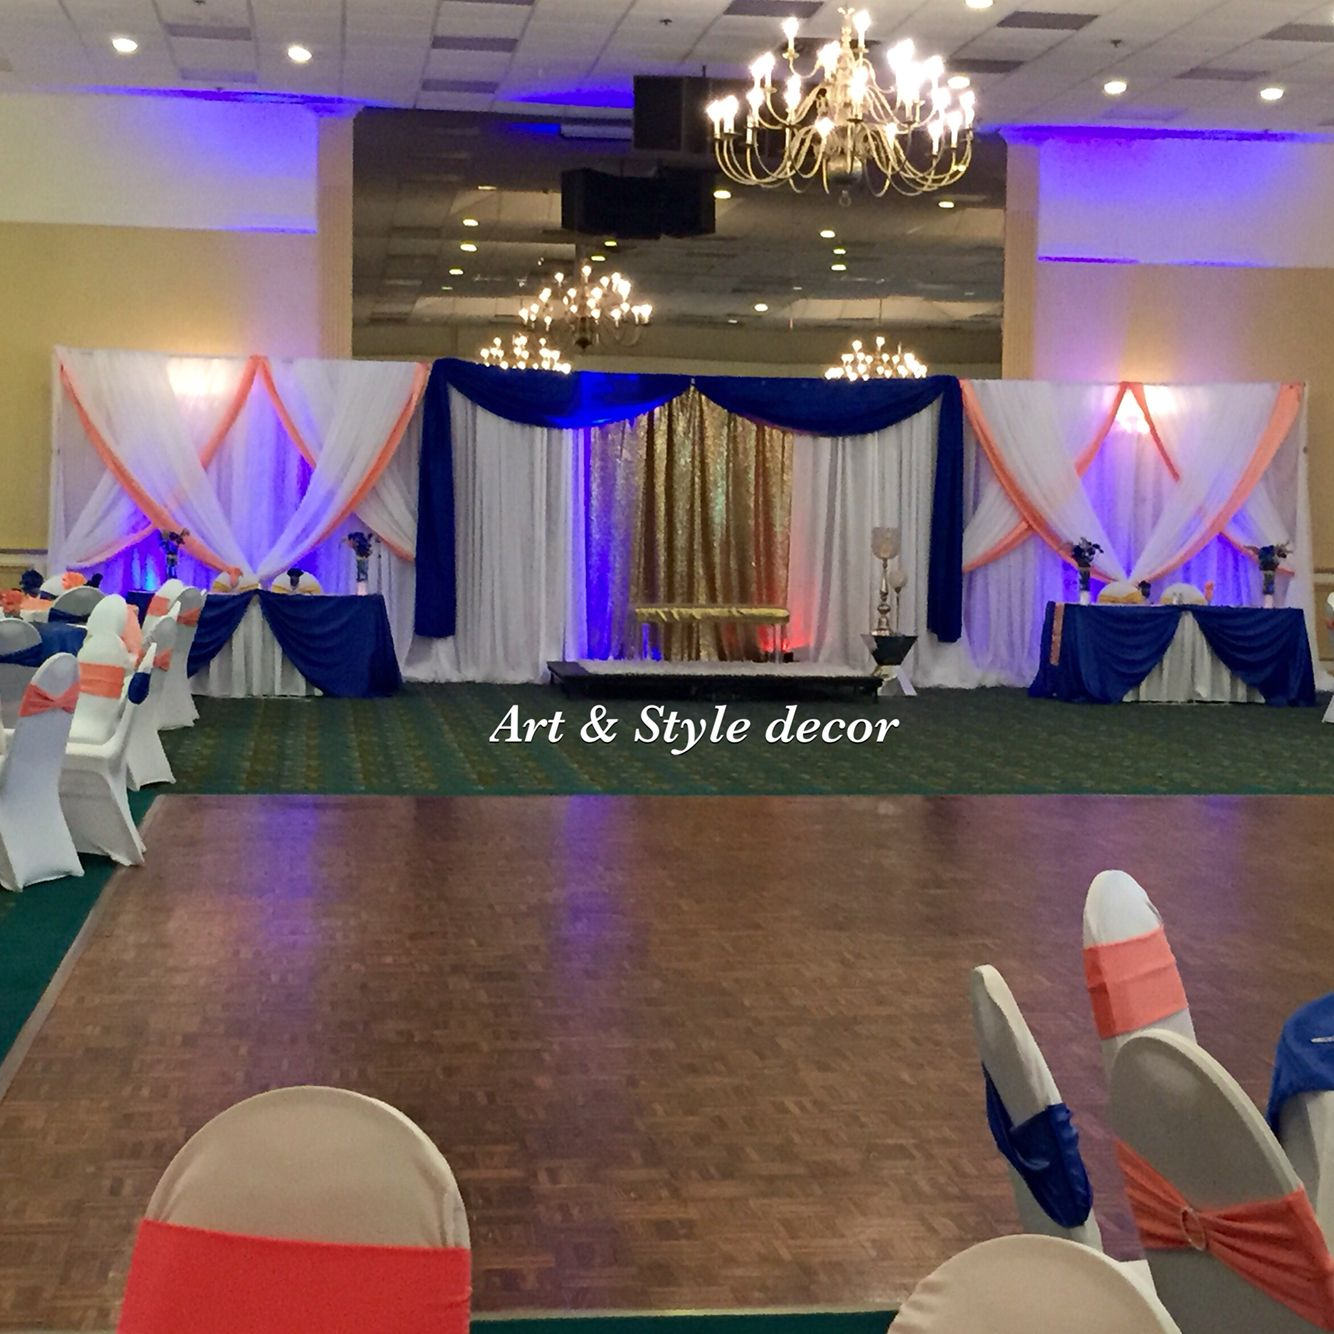 Royal Blue And Coral Wedding Decor Artandstyledecor